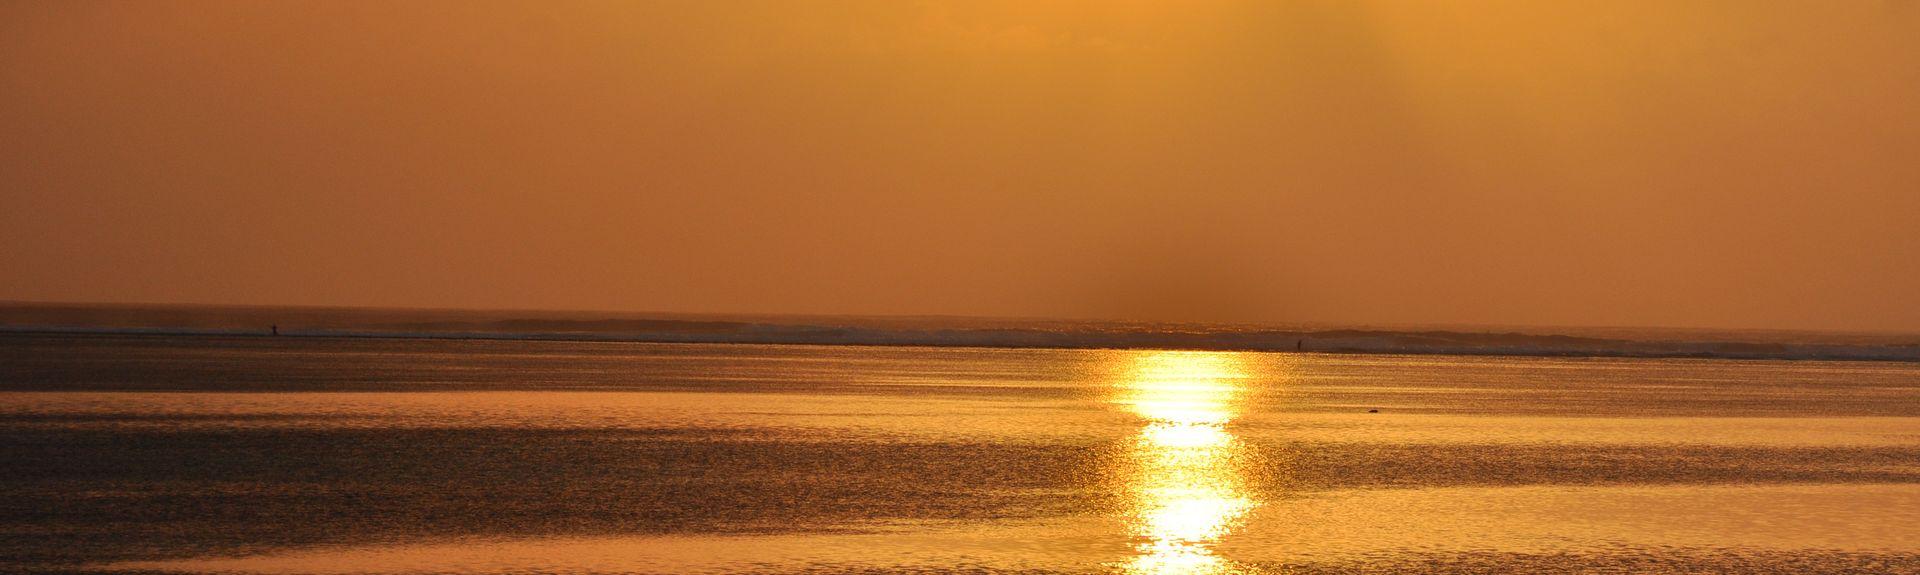 Strand von Kiwengwa, Kiwengwa, Tansania